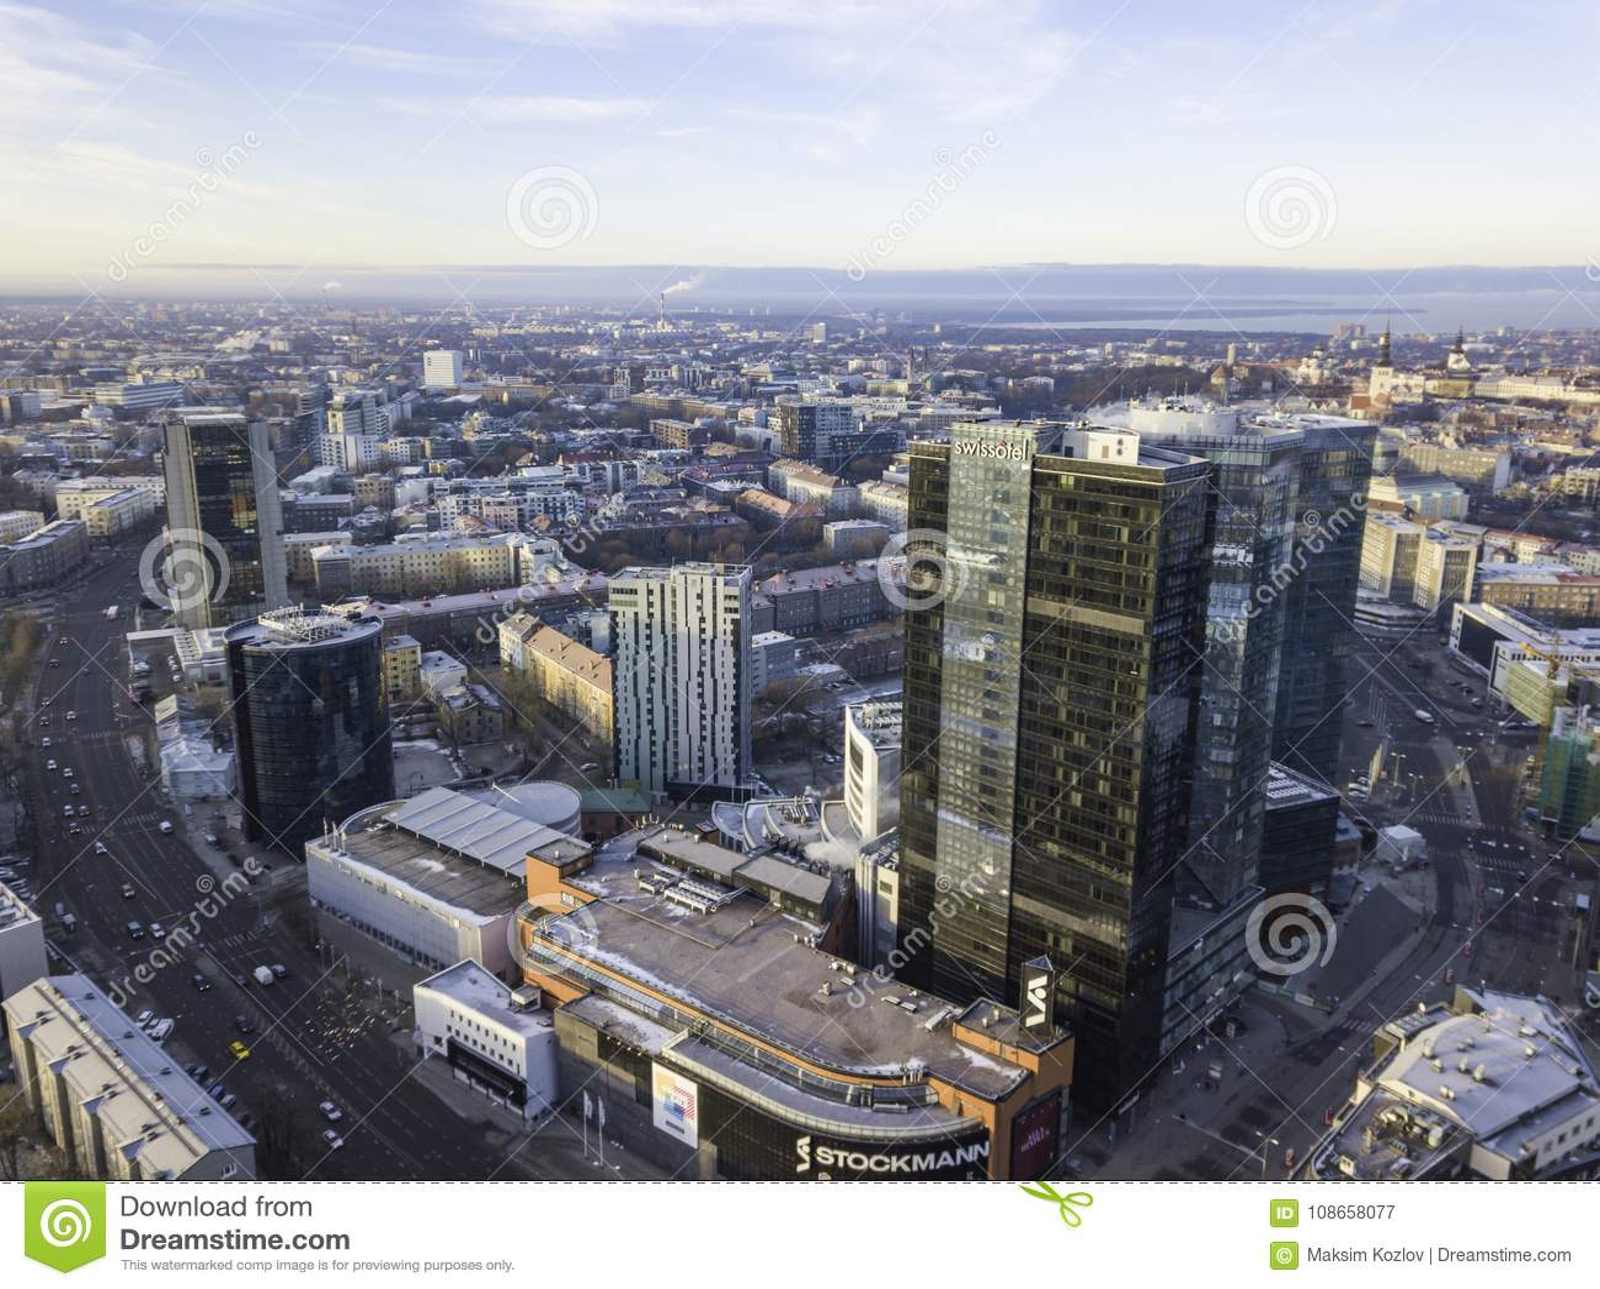 TALLINN, ESTONIA - 01, 2018 Aerial cityscape of modern business